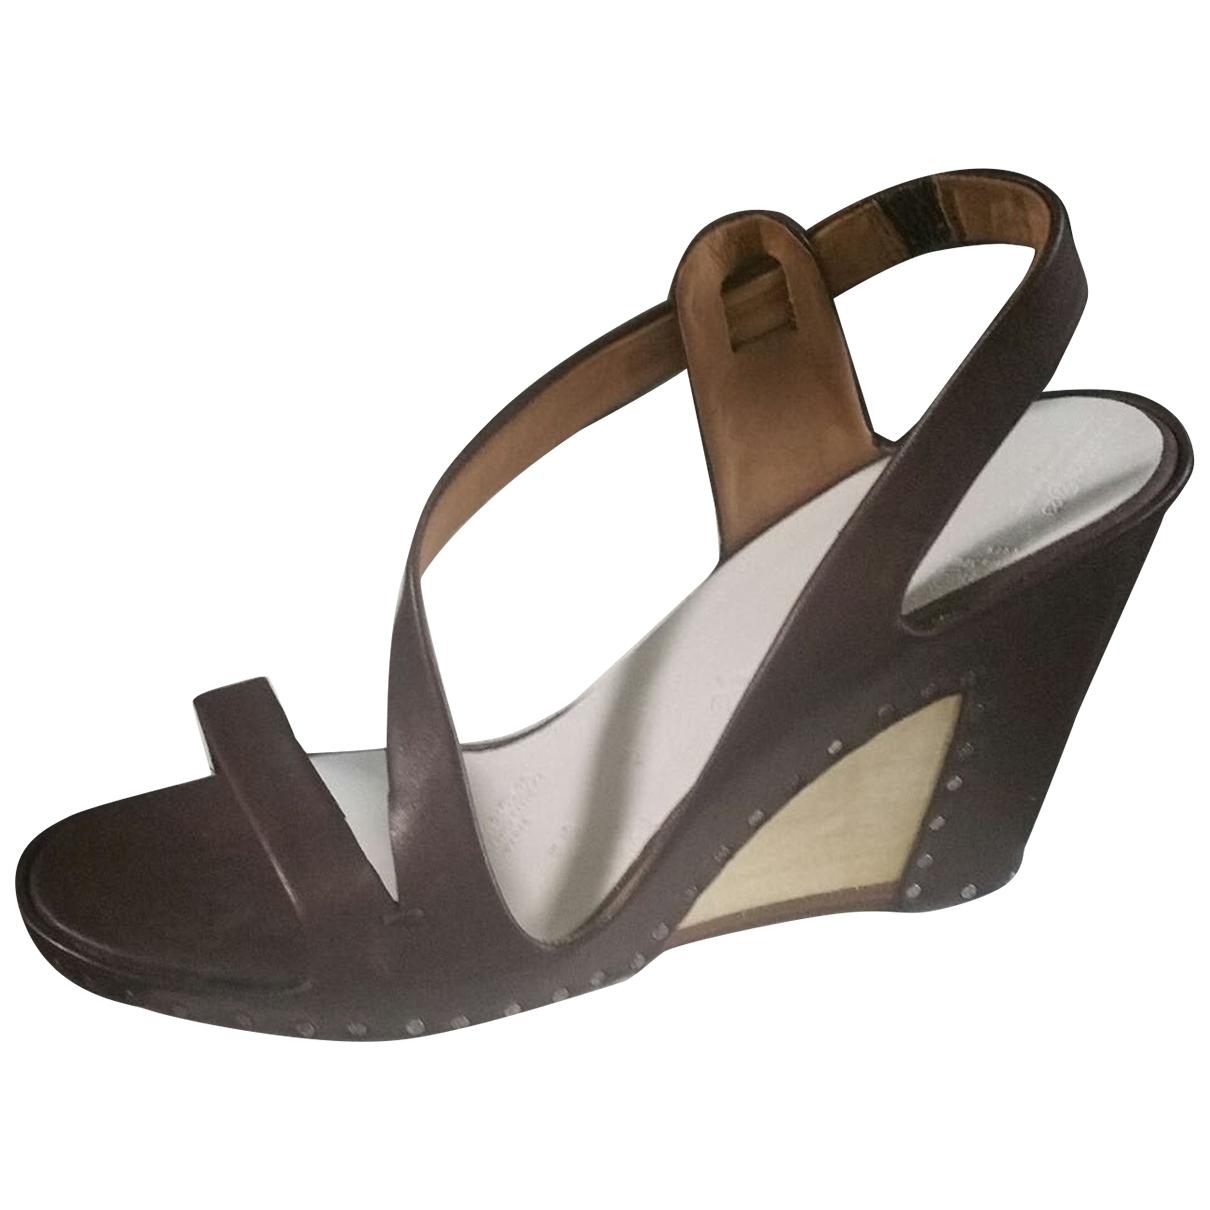 Maison Martin Margiela \N Brown Leather Sandals for Women 37.5 EU